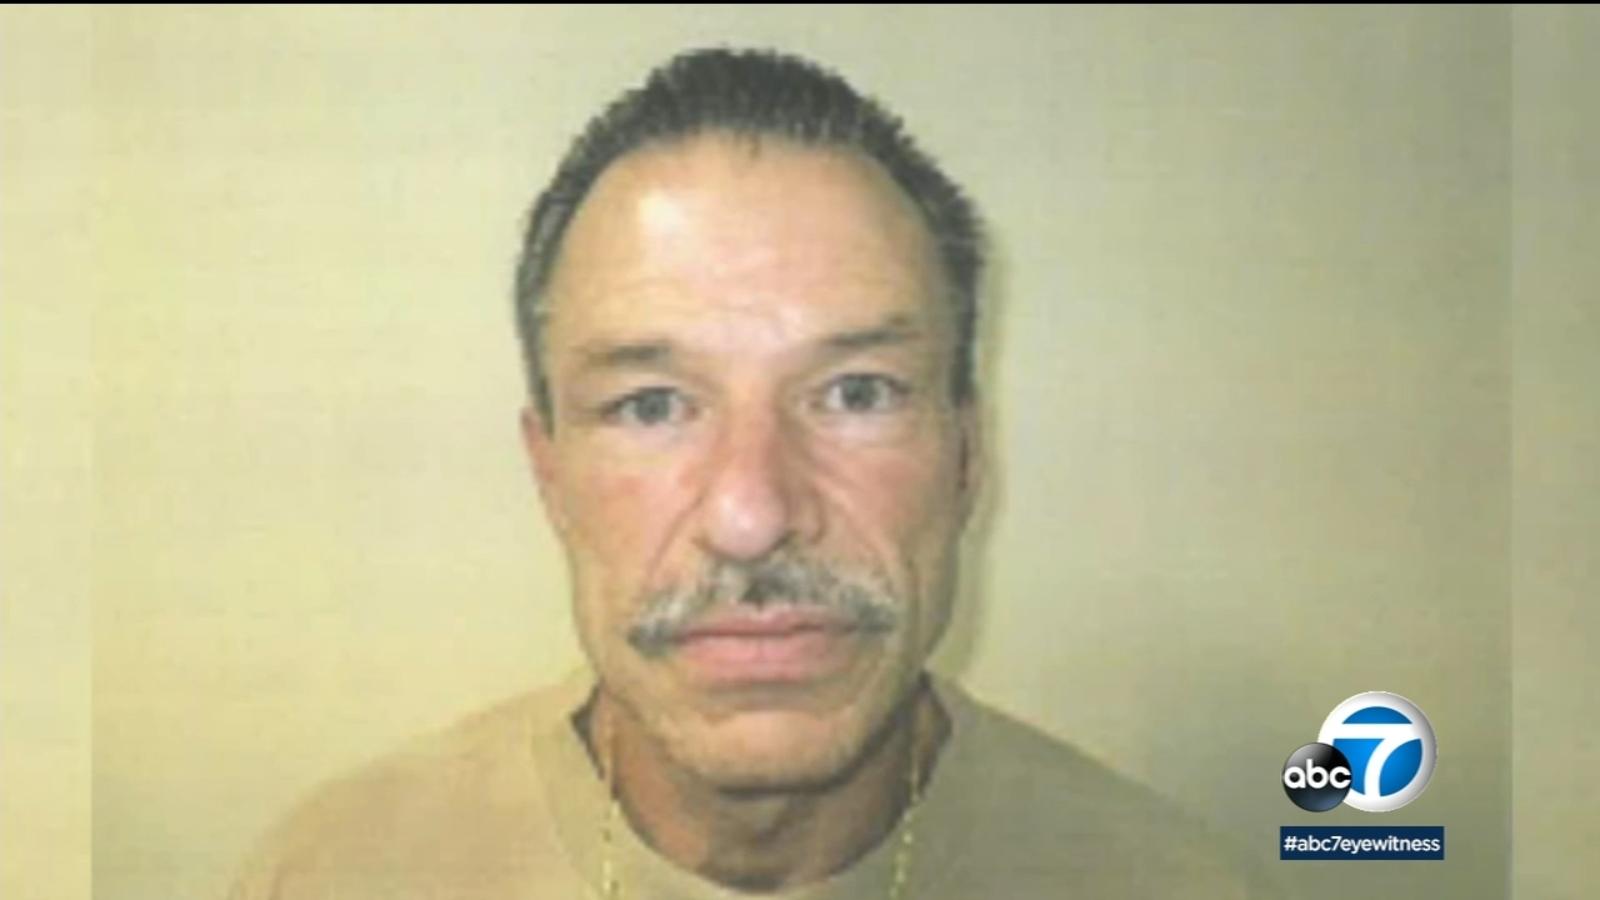 joseph guinnane sex offender in San Bernardino